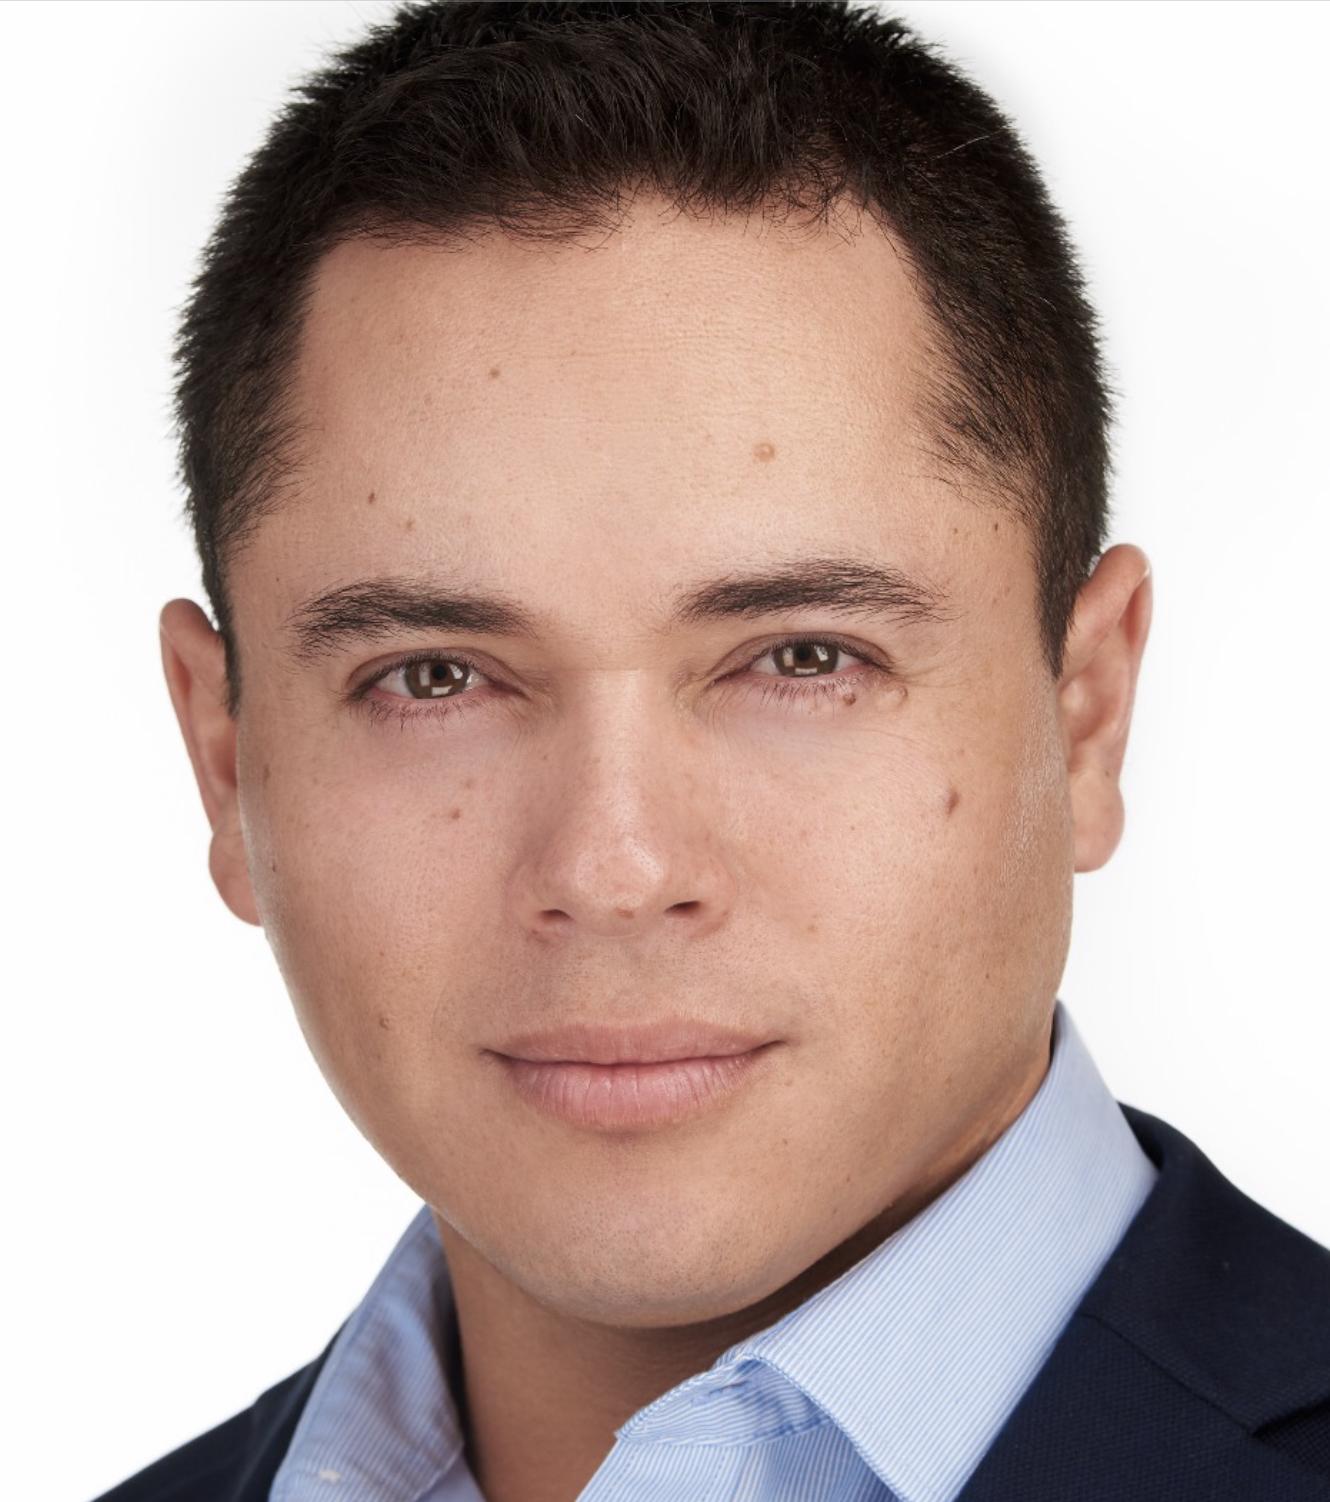 Andres Hurtado Rangel